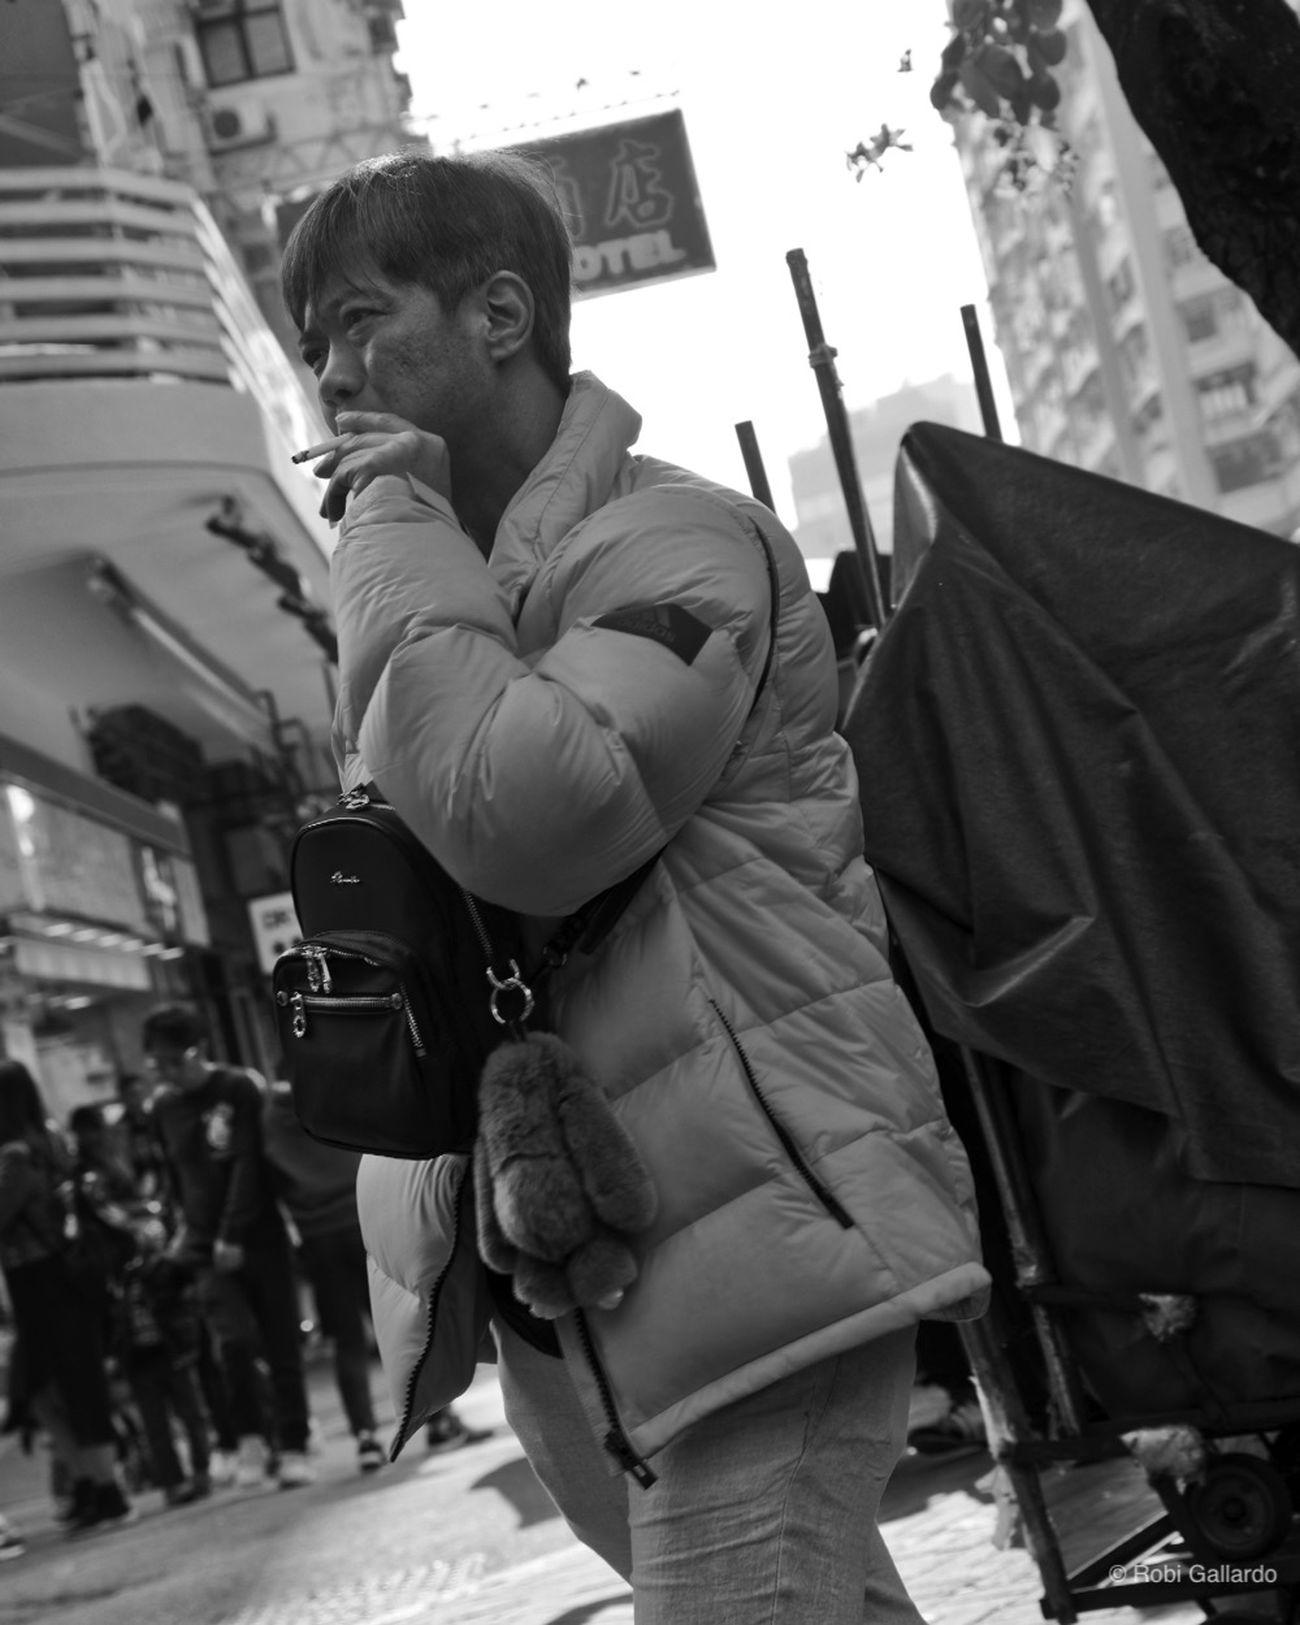 Blackandwhite City DSLR DSLR Photography Man One Person Pentax People Smoking Streetphoto_bw Streetphotography